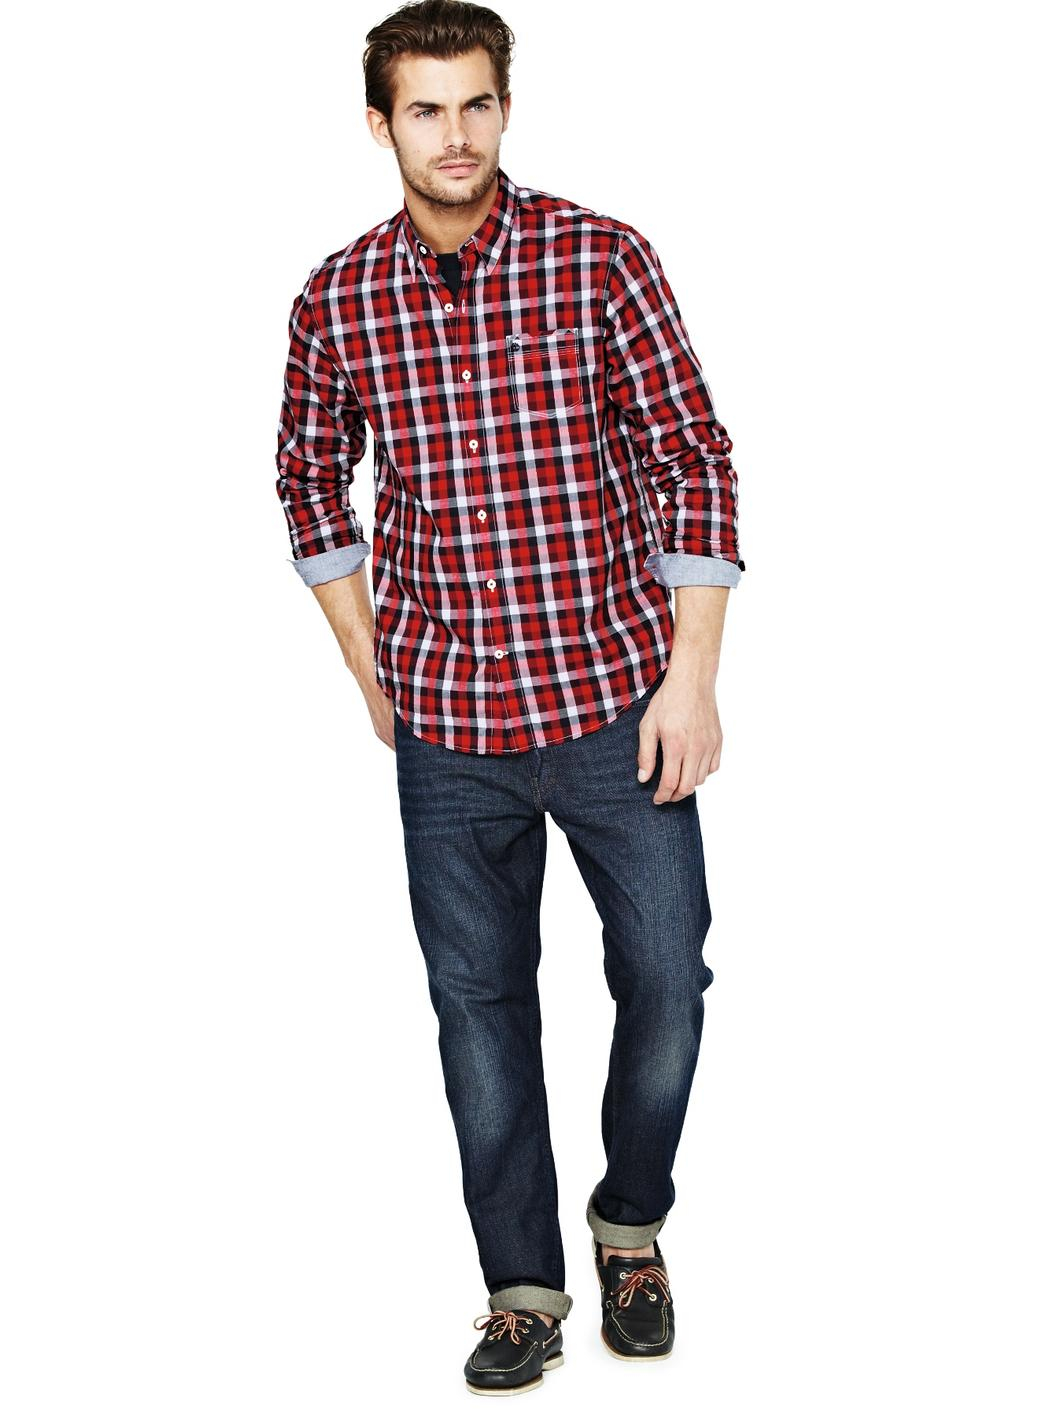 Timberland mens long sleeve plaid shirt in black for men for Mens plaid shirts long sleeve